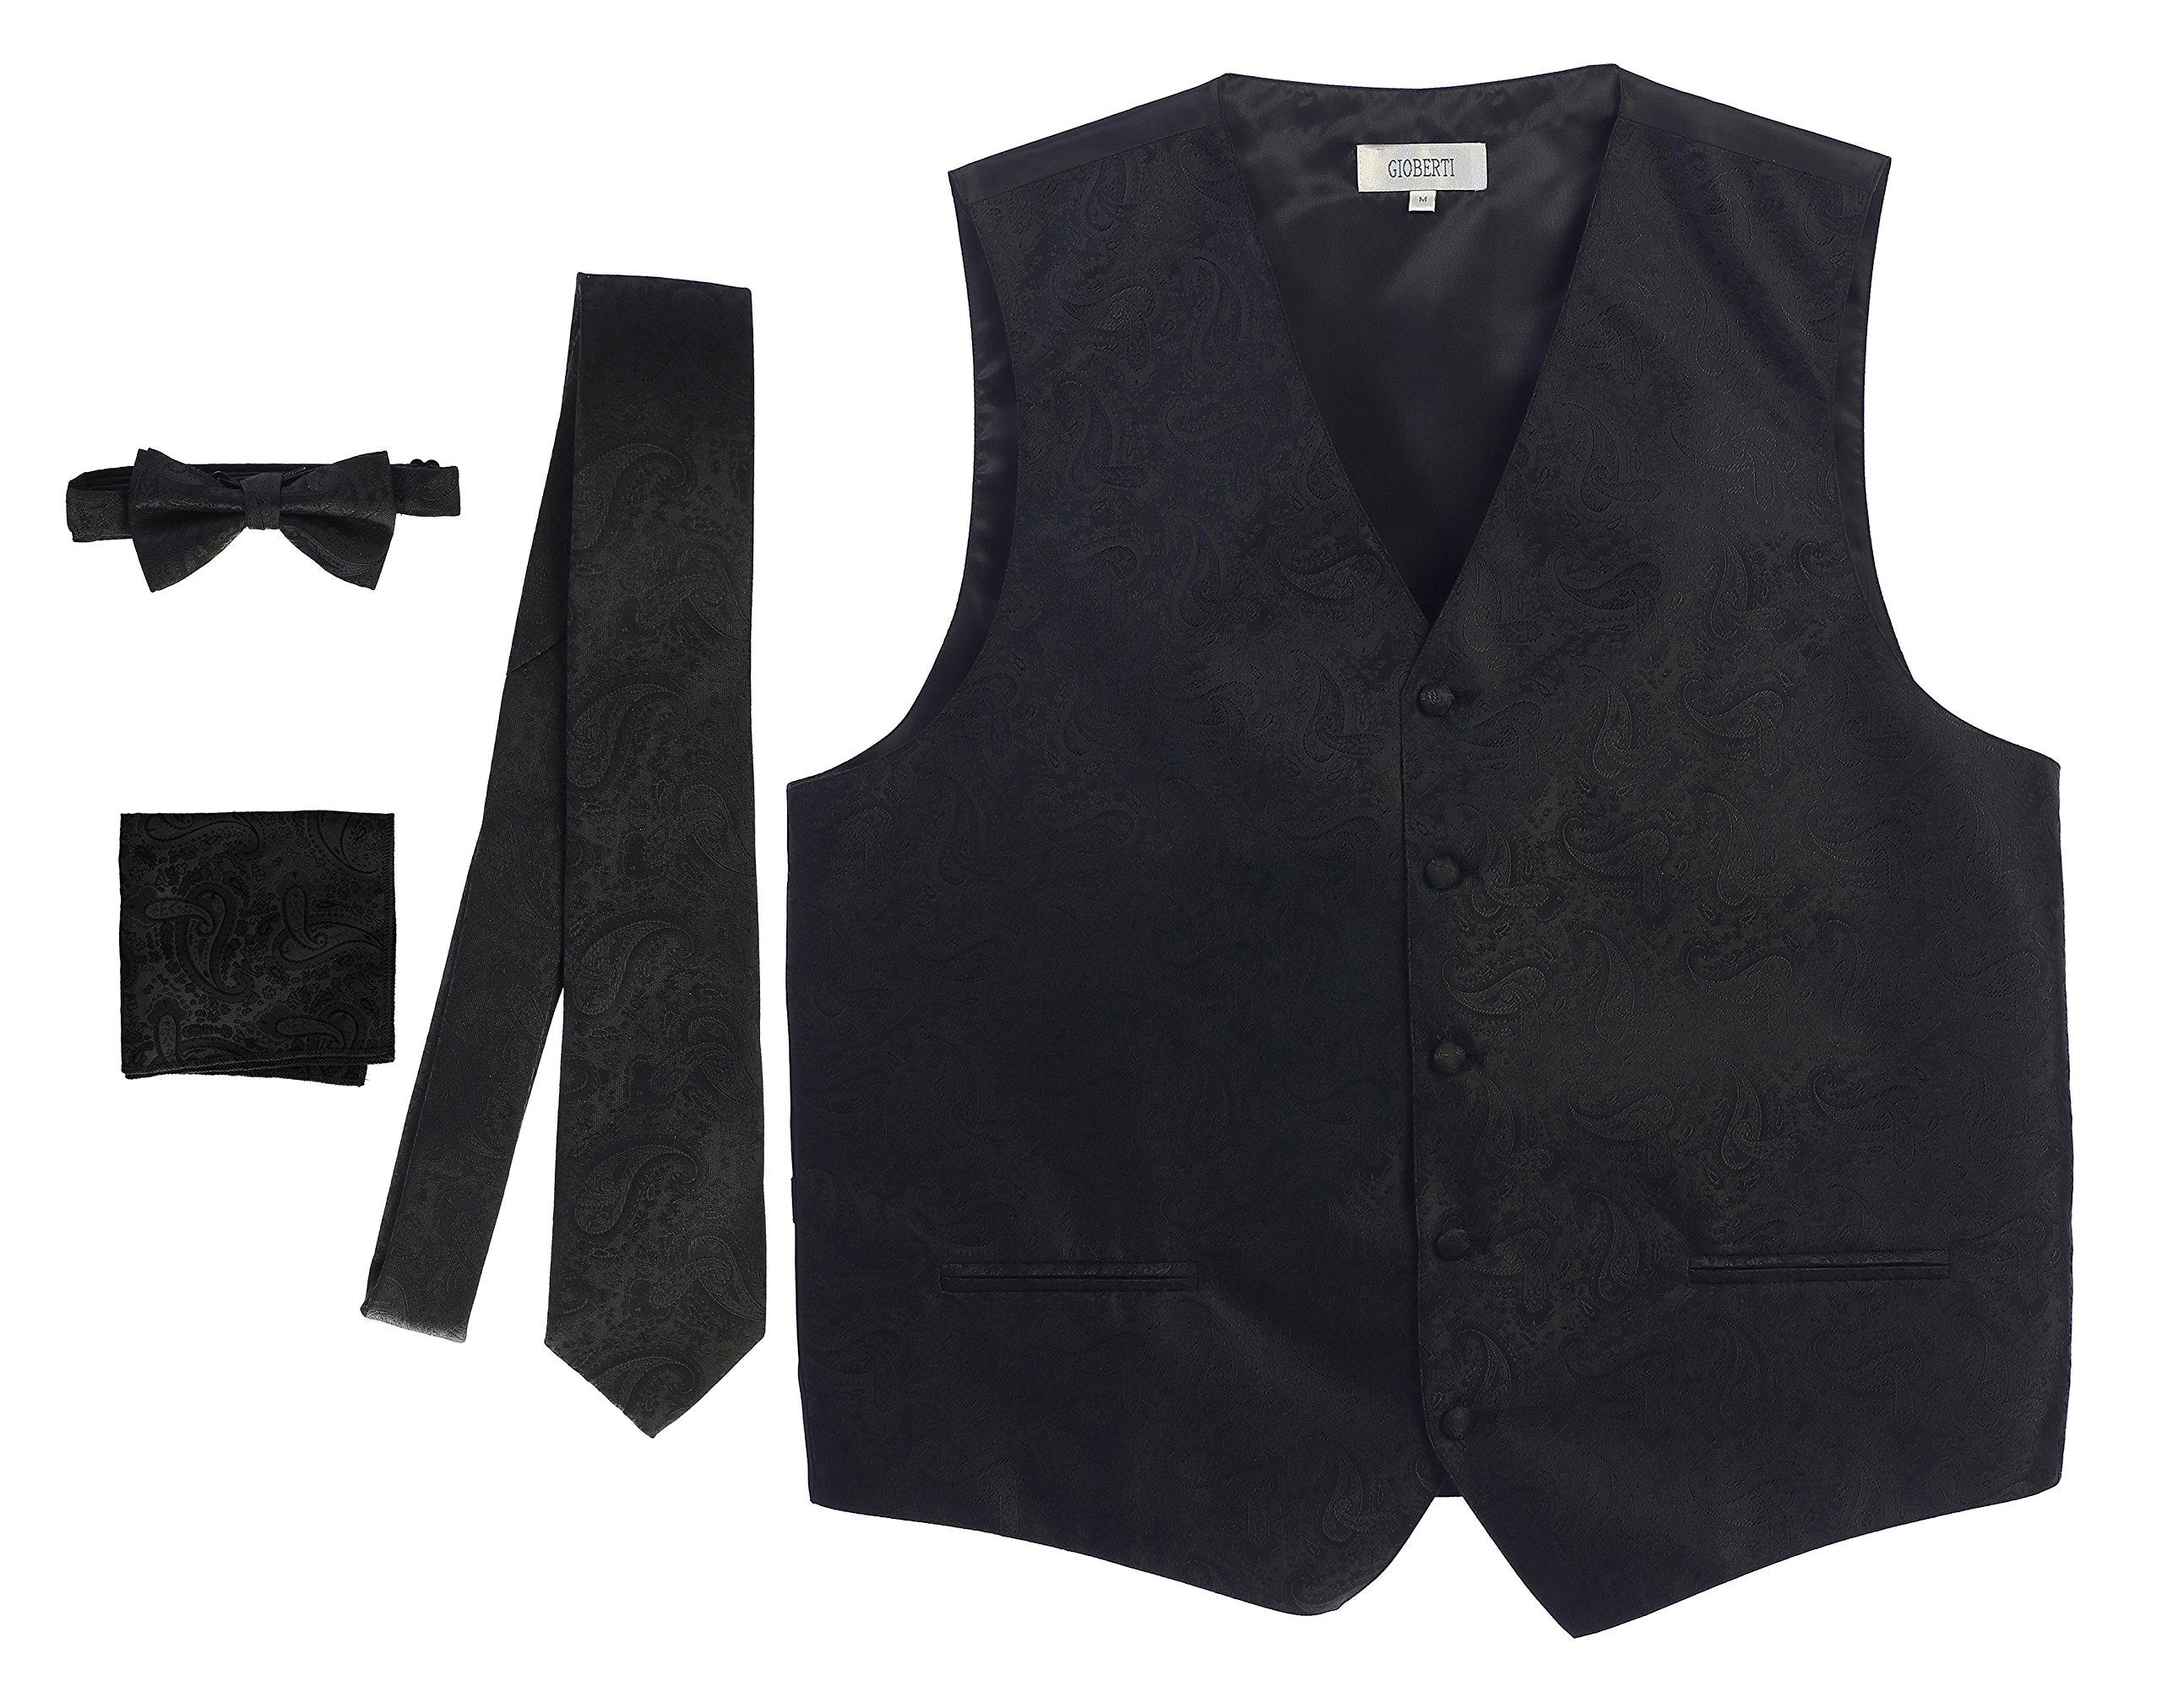 Gioberti Men's 4 Piece Formal Paisley Vest Set, Black, X Large